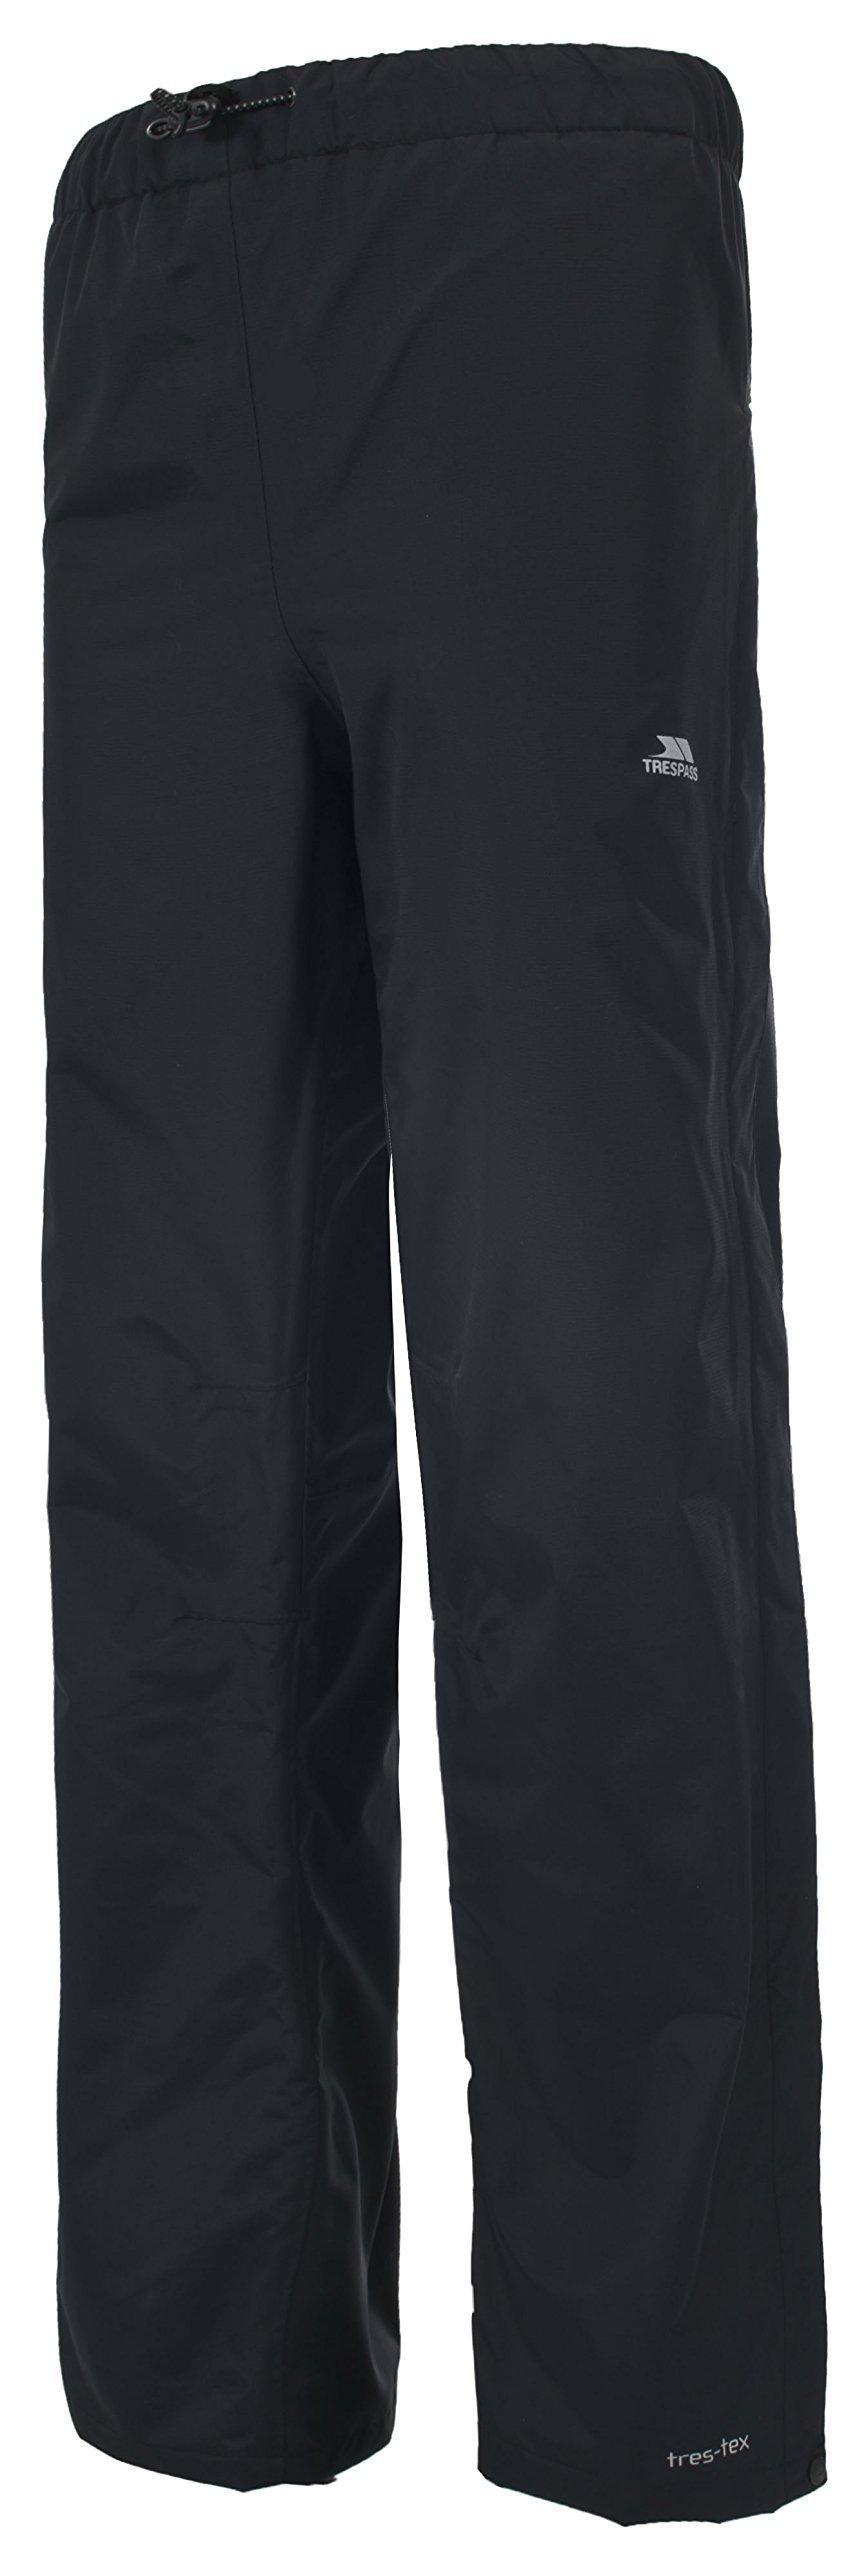 61gpUM%2BNvCL - Trespass Men's Purnell Waterproof Trousers